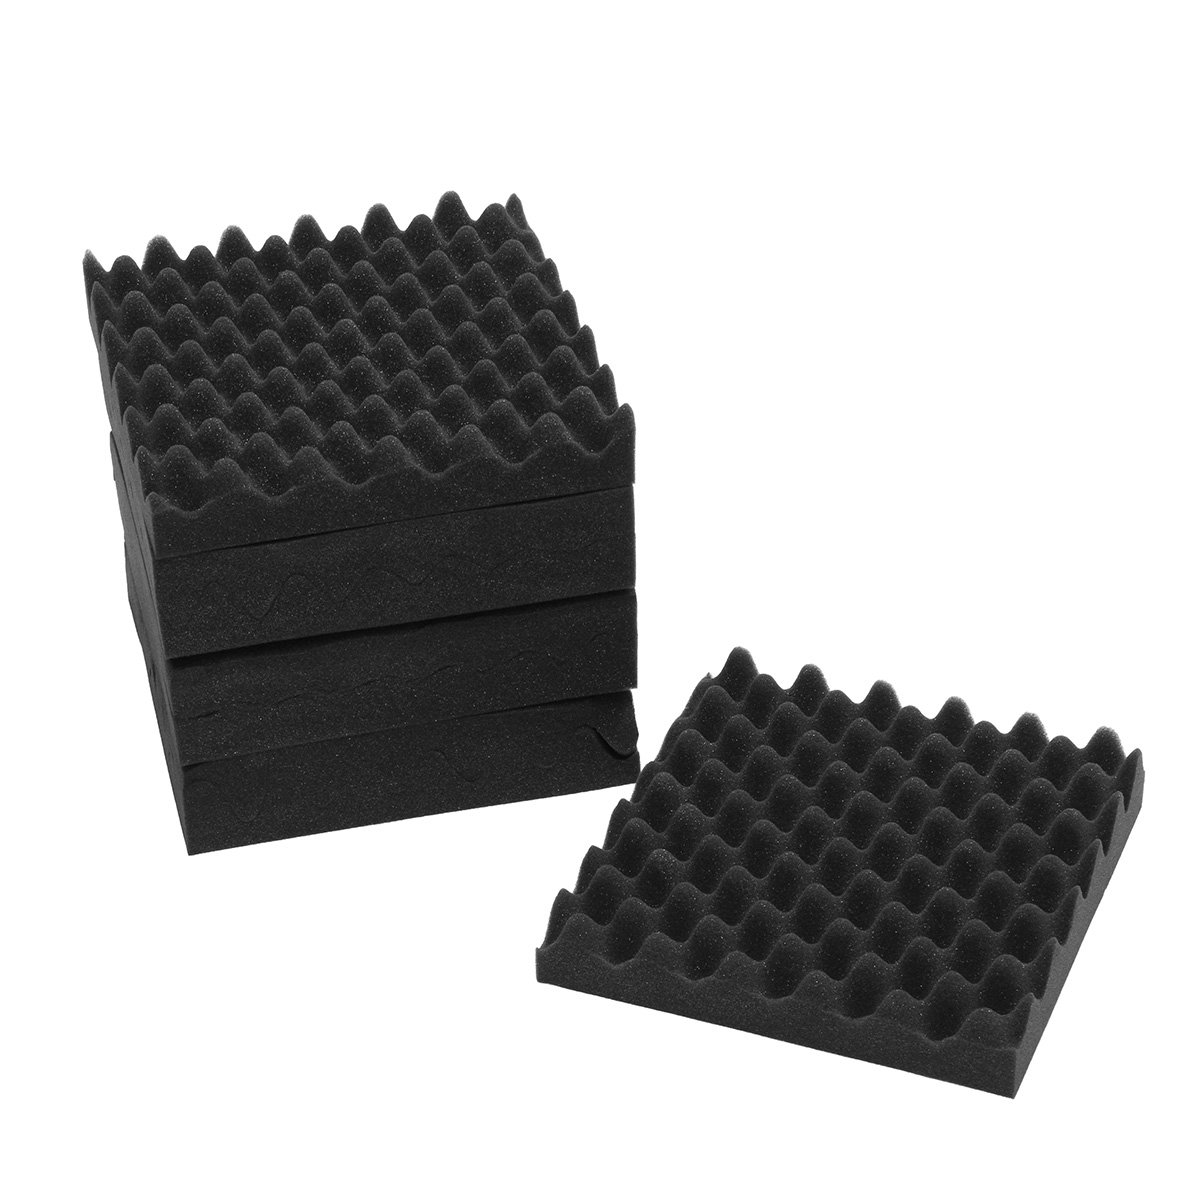 8PCS 12x12x2.5'' Acoustic Sound Studio Soundproof Foam Egg Crate Foam Wall Tile